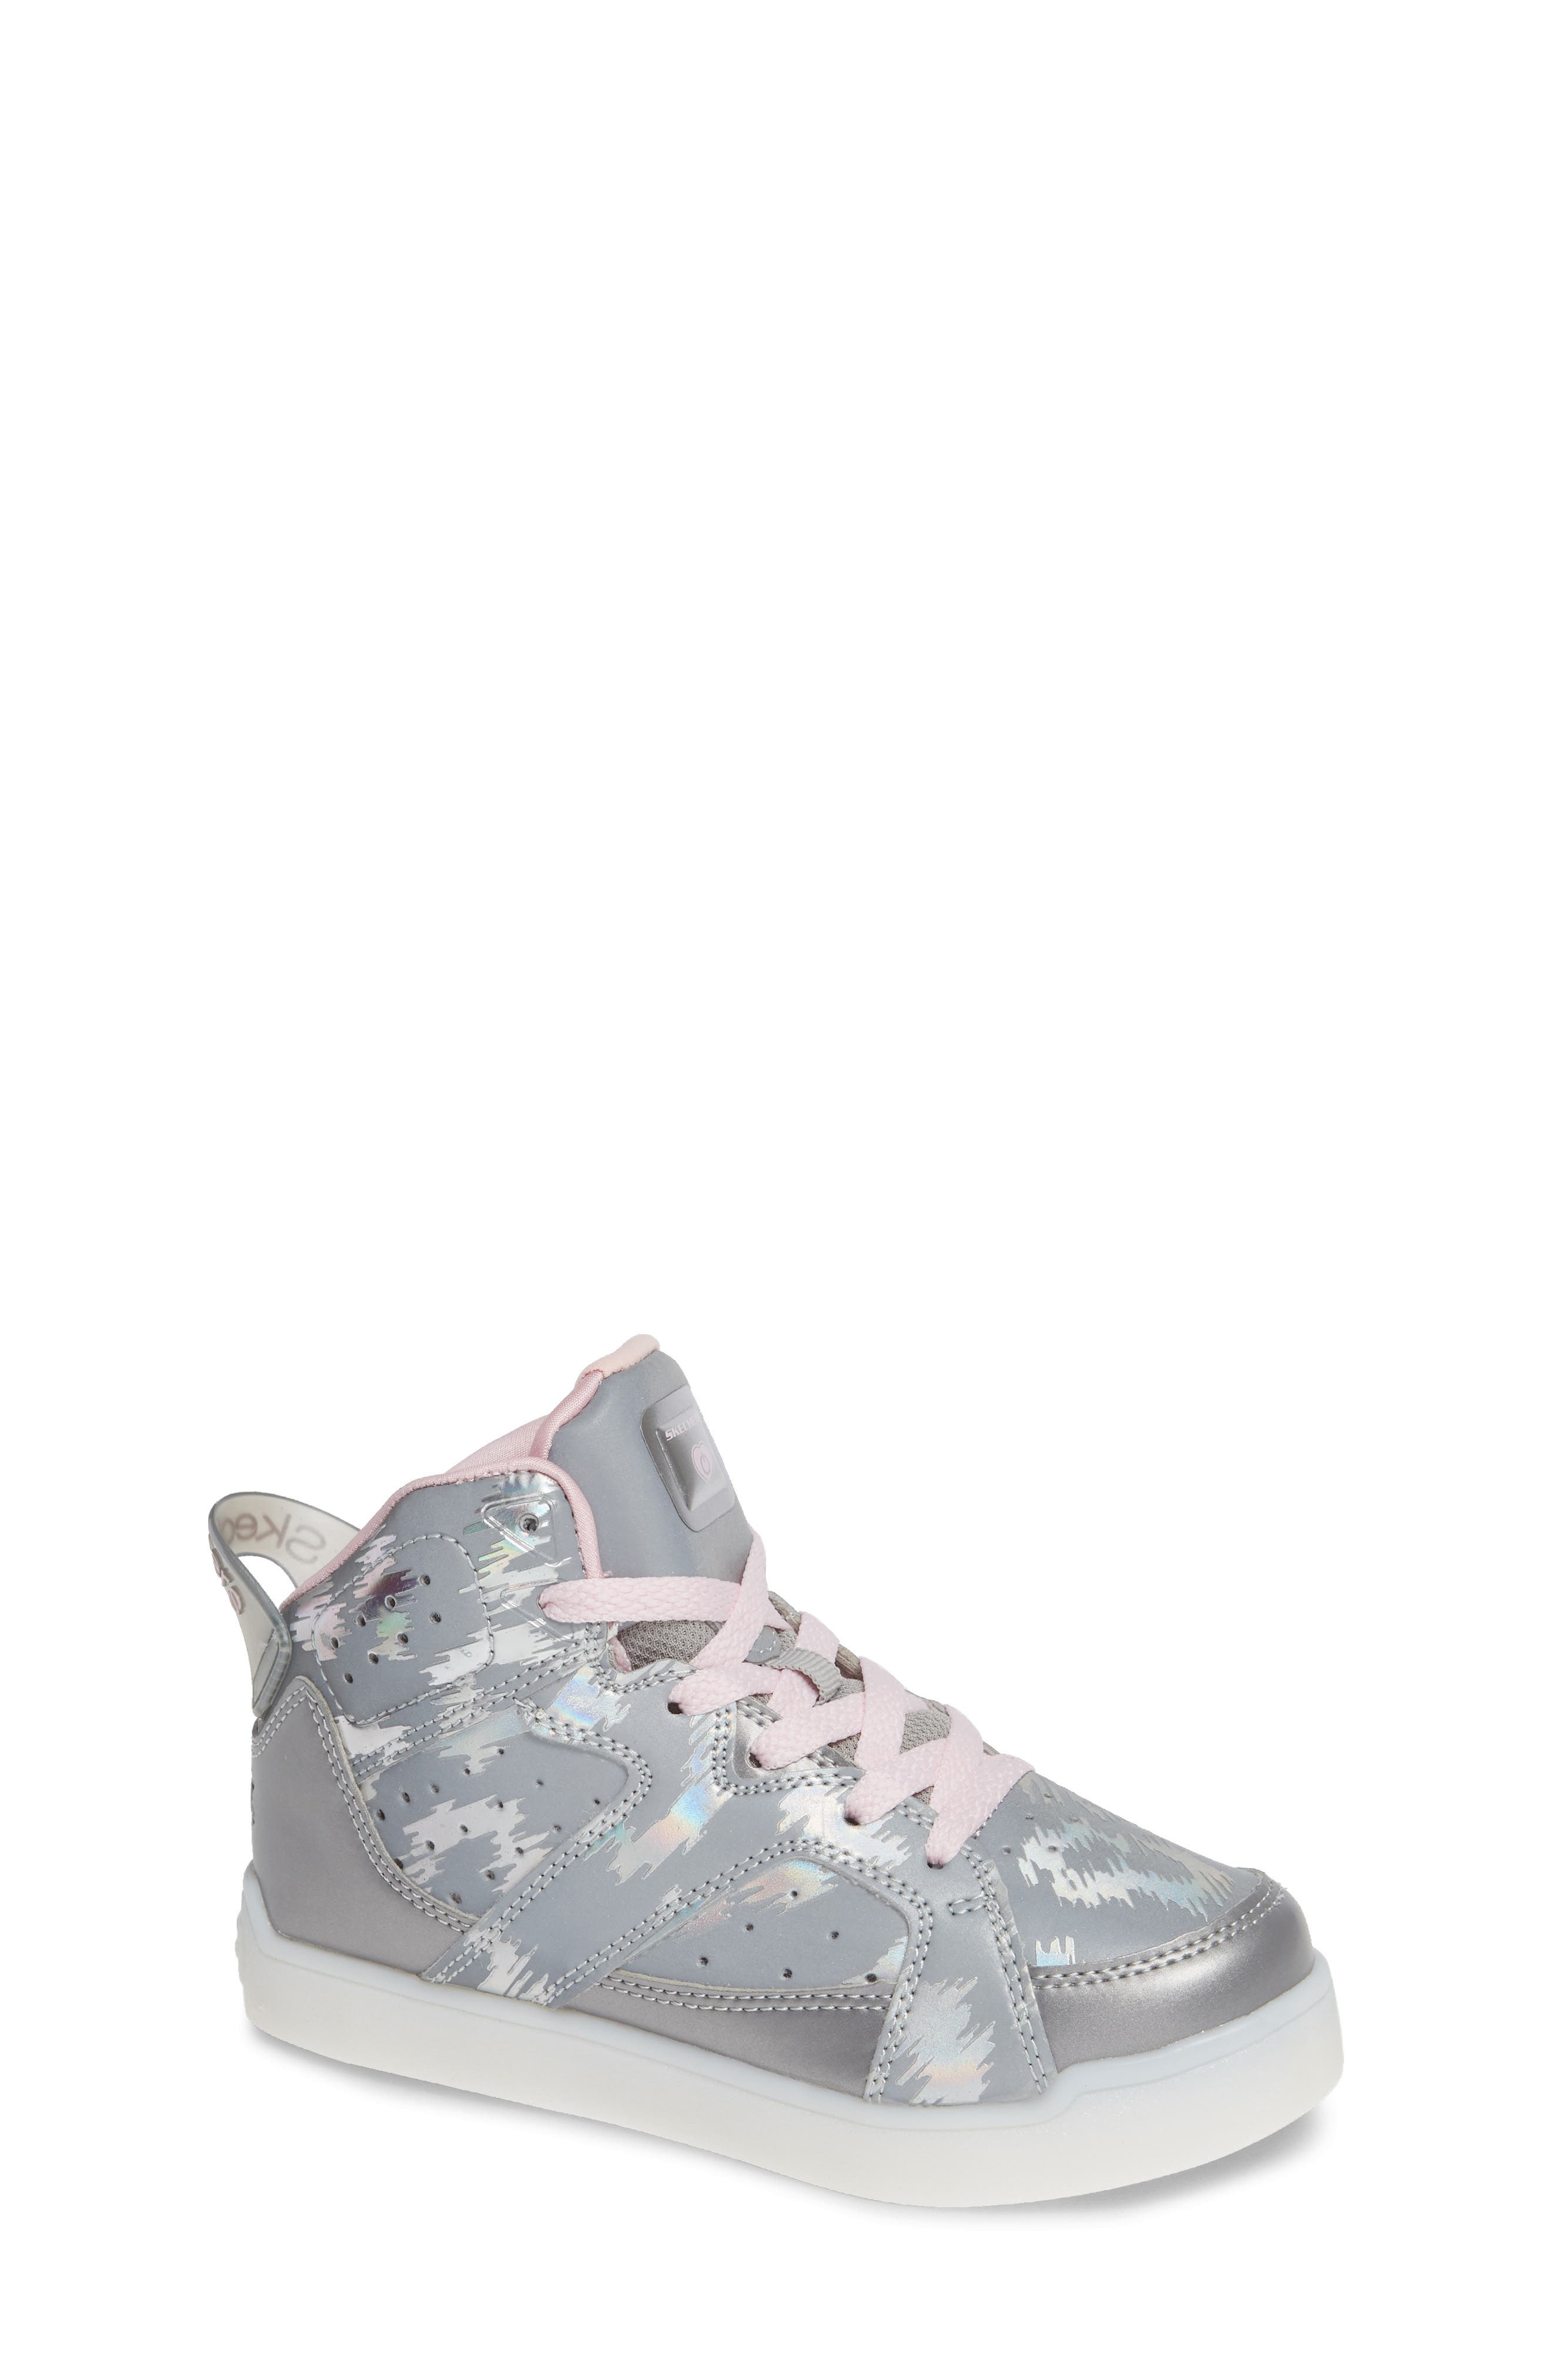 SKECHERS,                             Energy Lights Pro Reflecti-Fab Sneaker,                             Main thumbnail 1, color,                             040